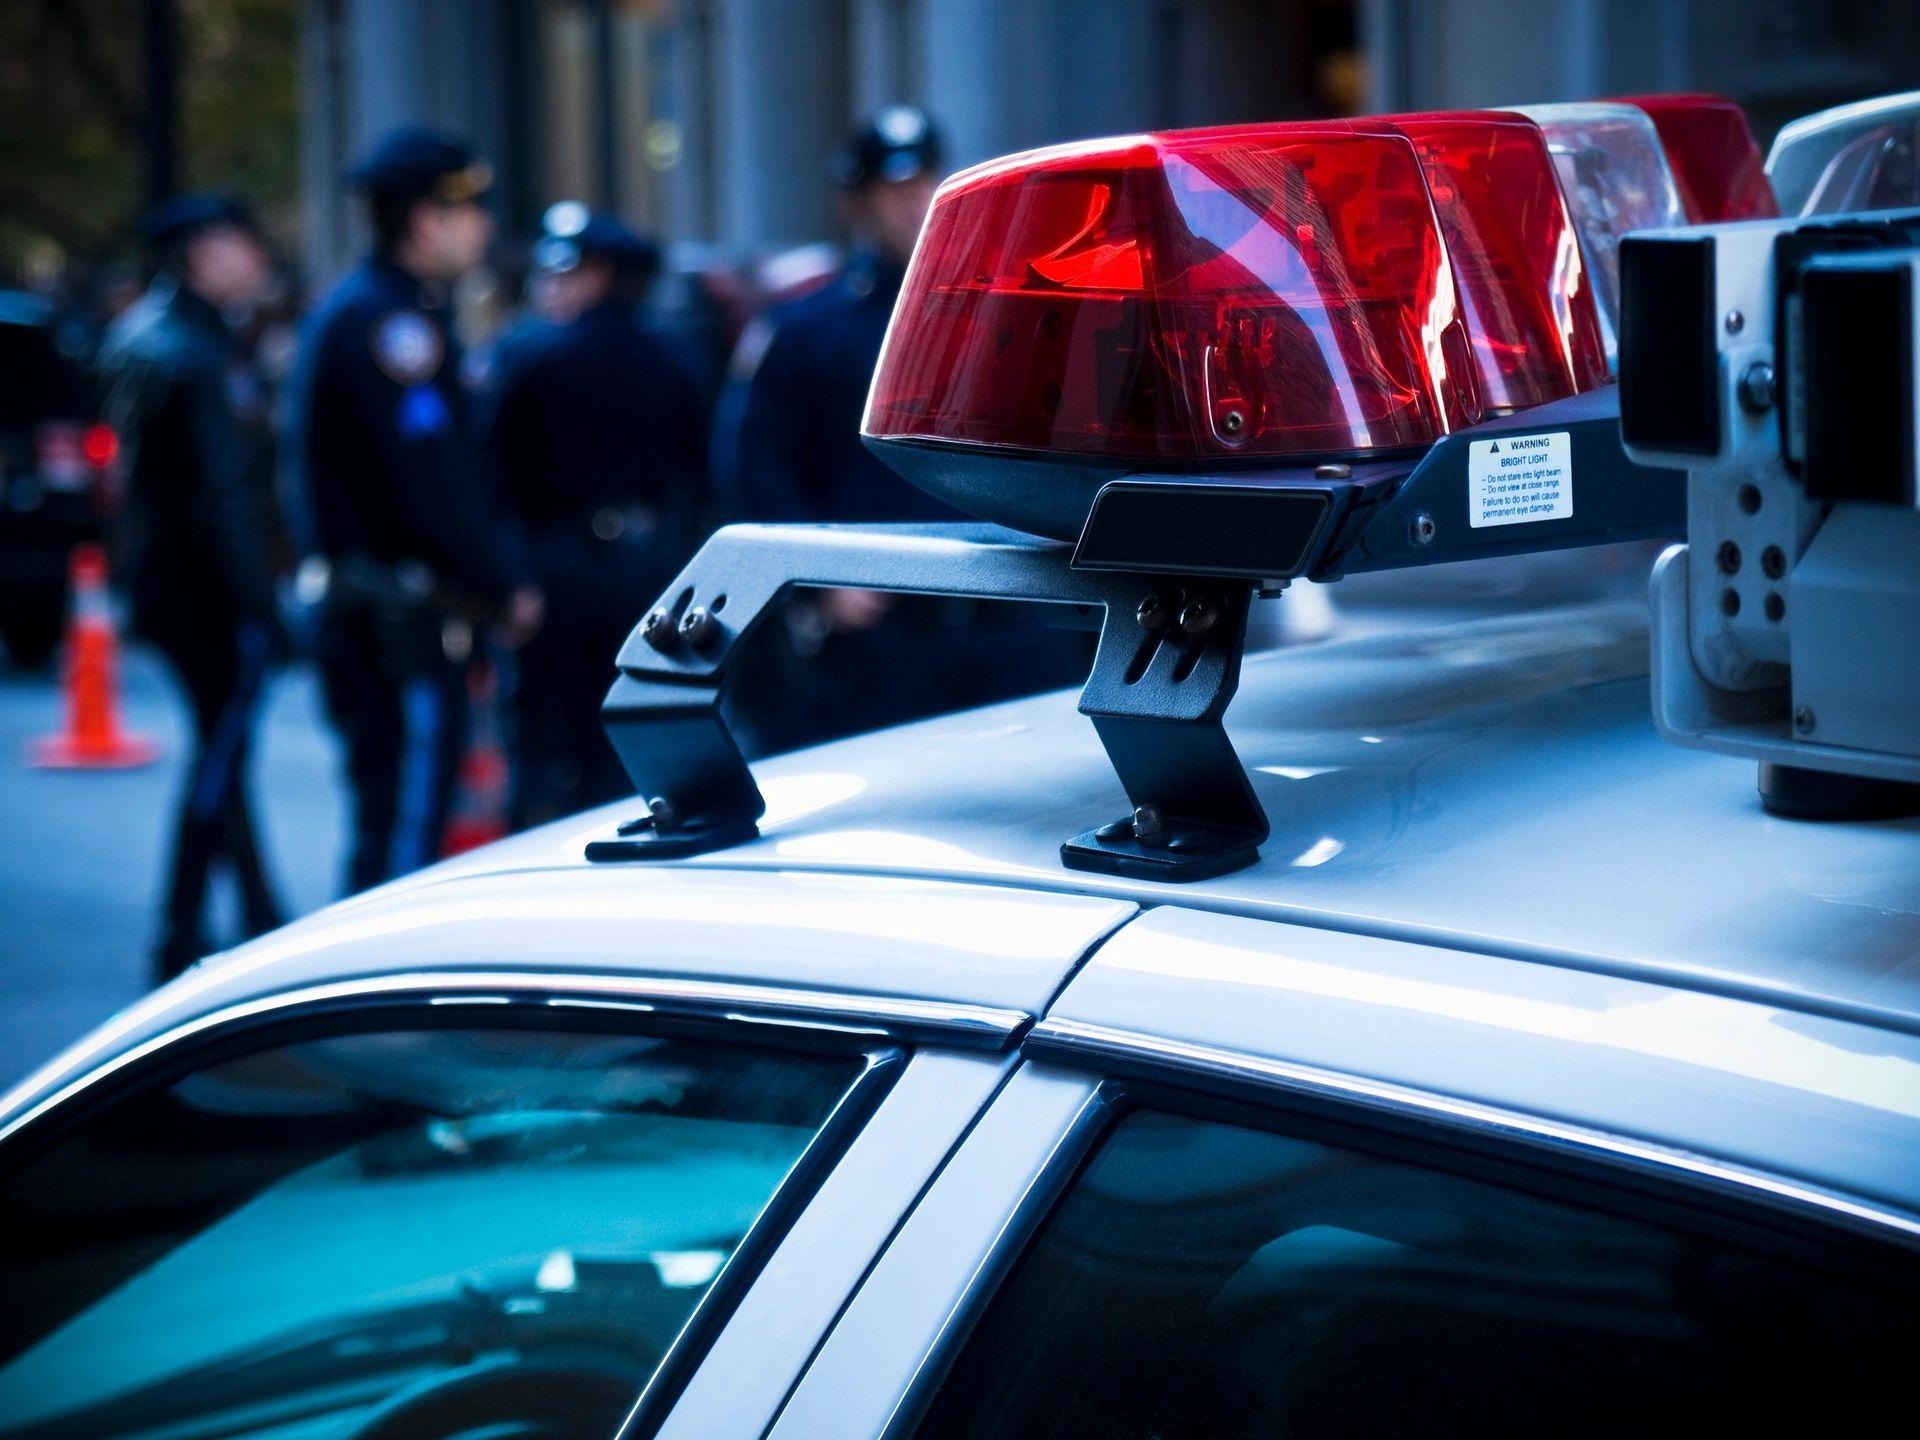 auburn police department, apd, city of auburn